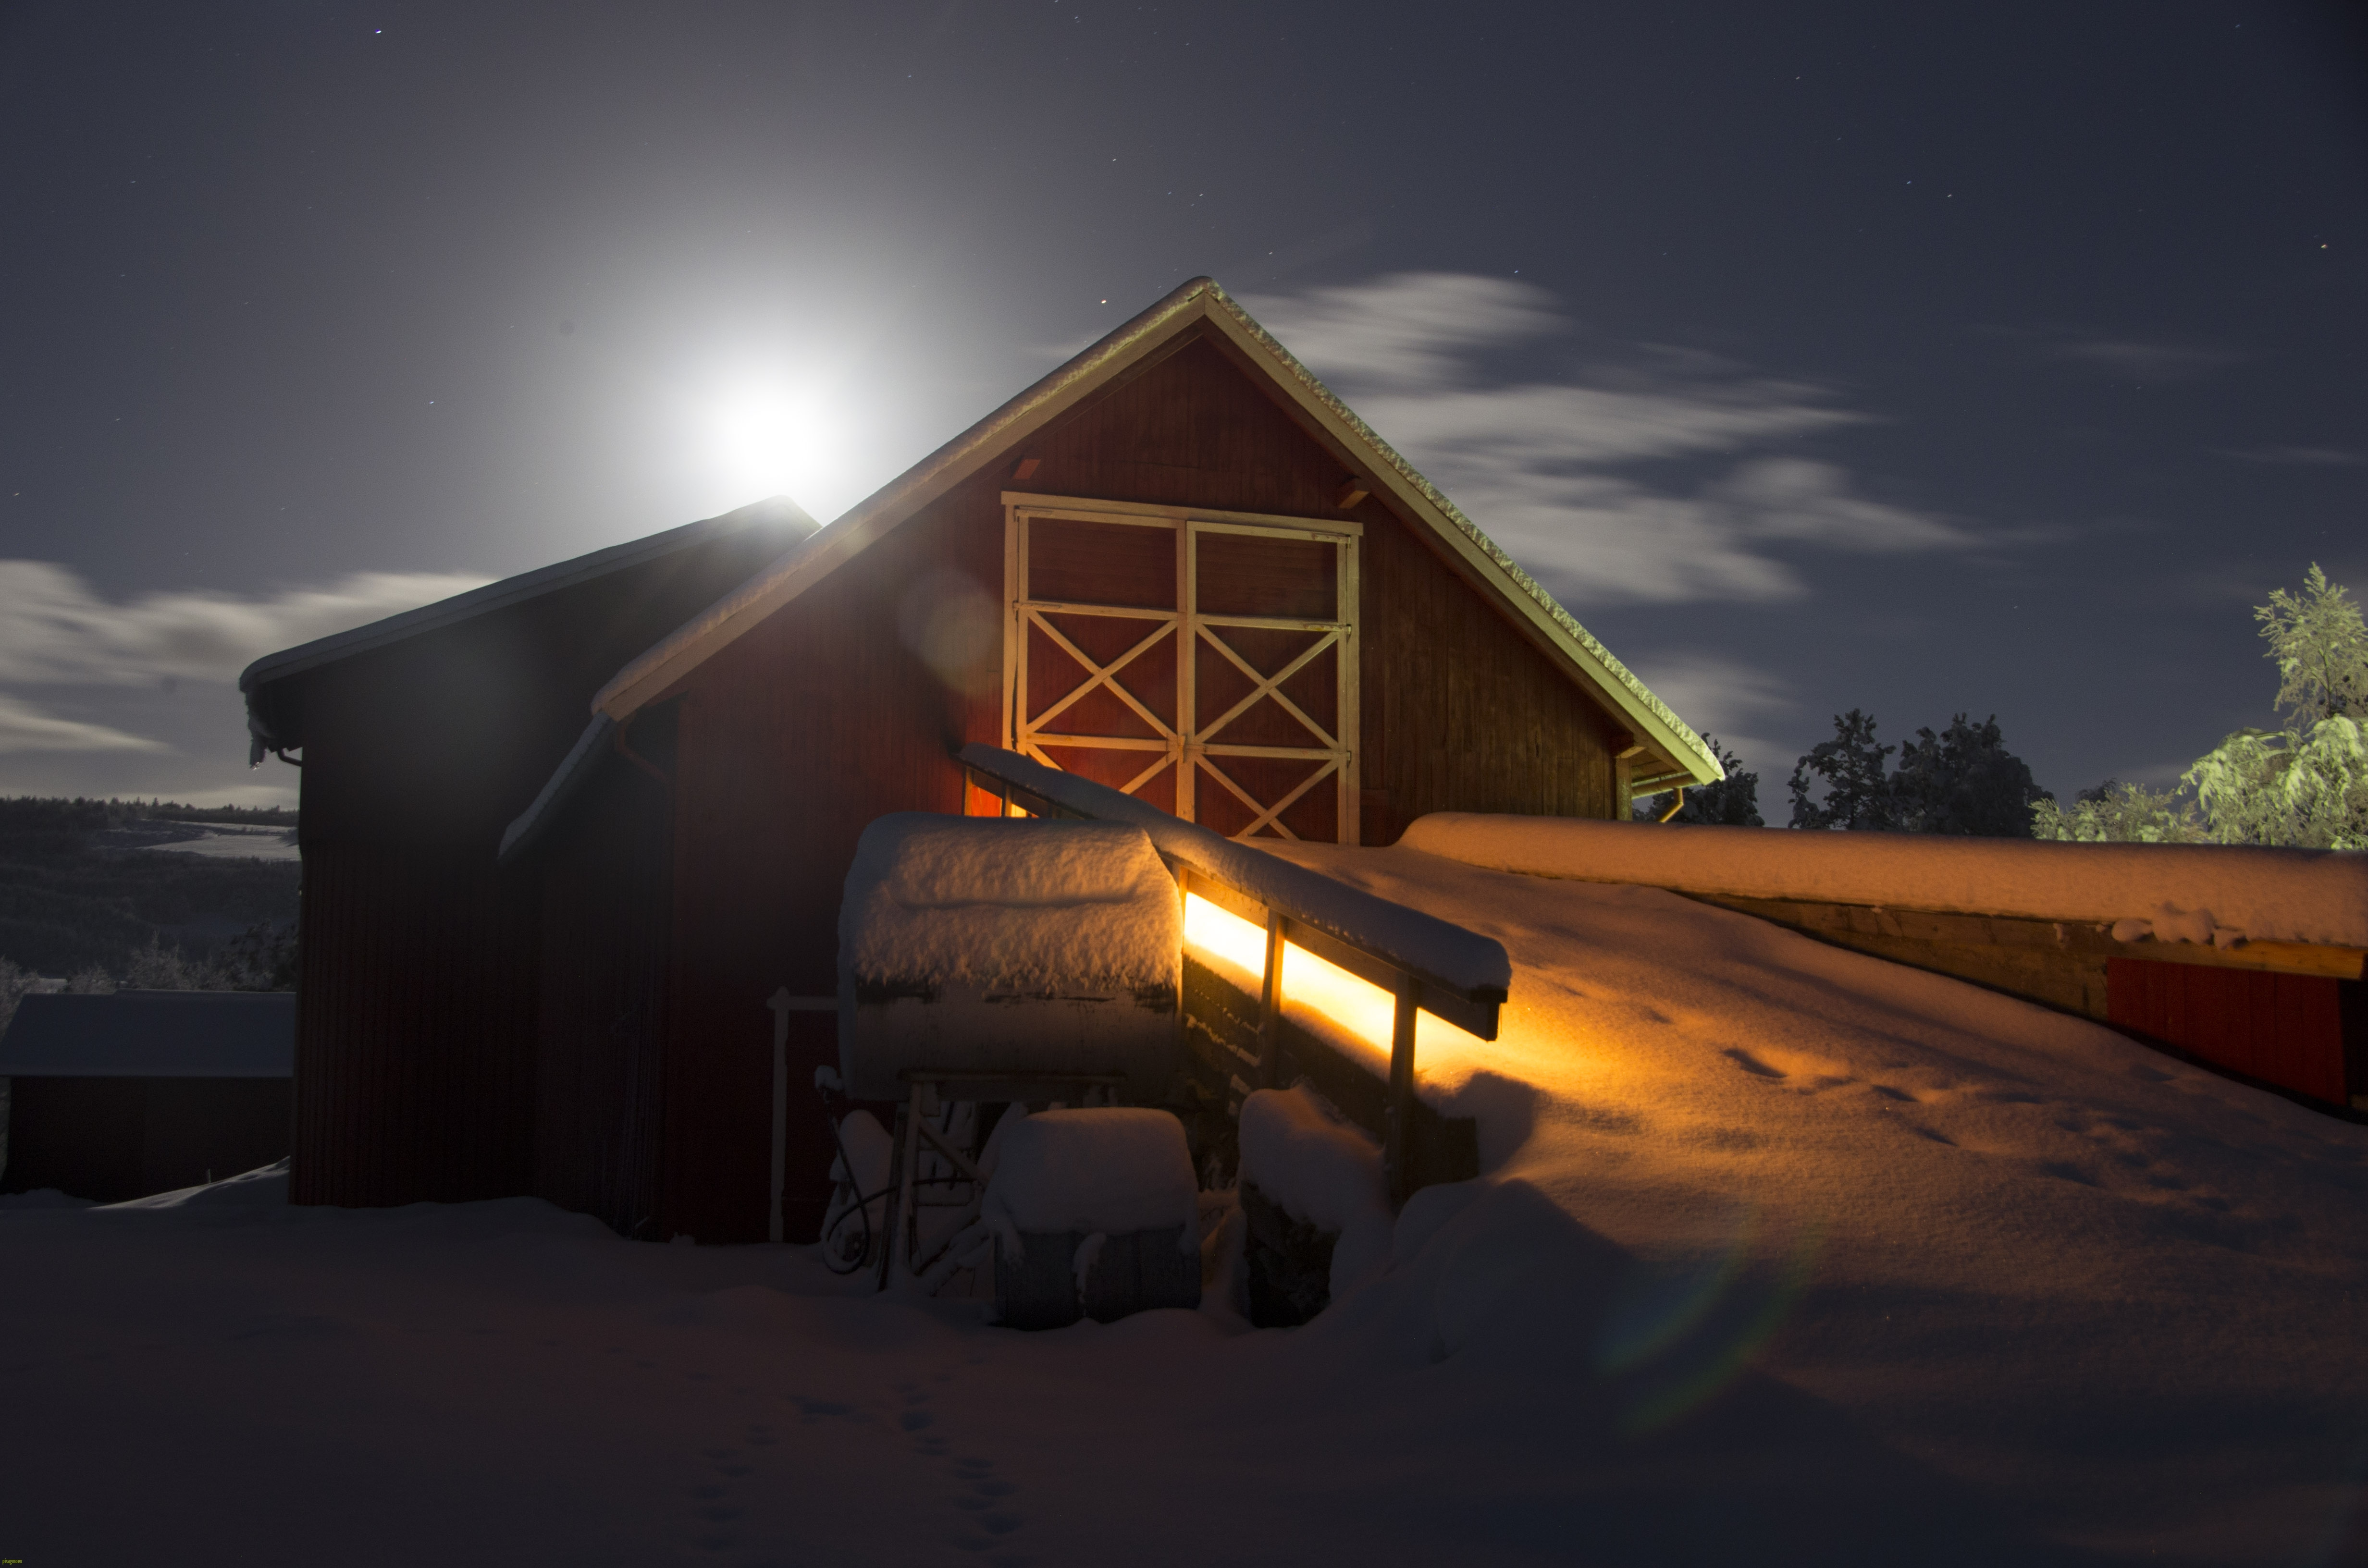 Julelåve i måneskinn, 13 des.2016